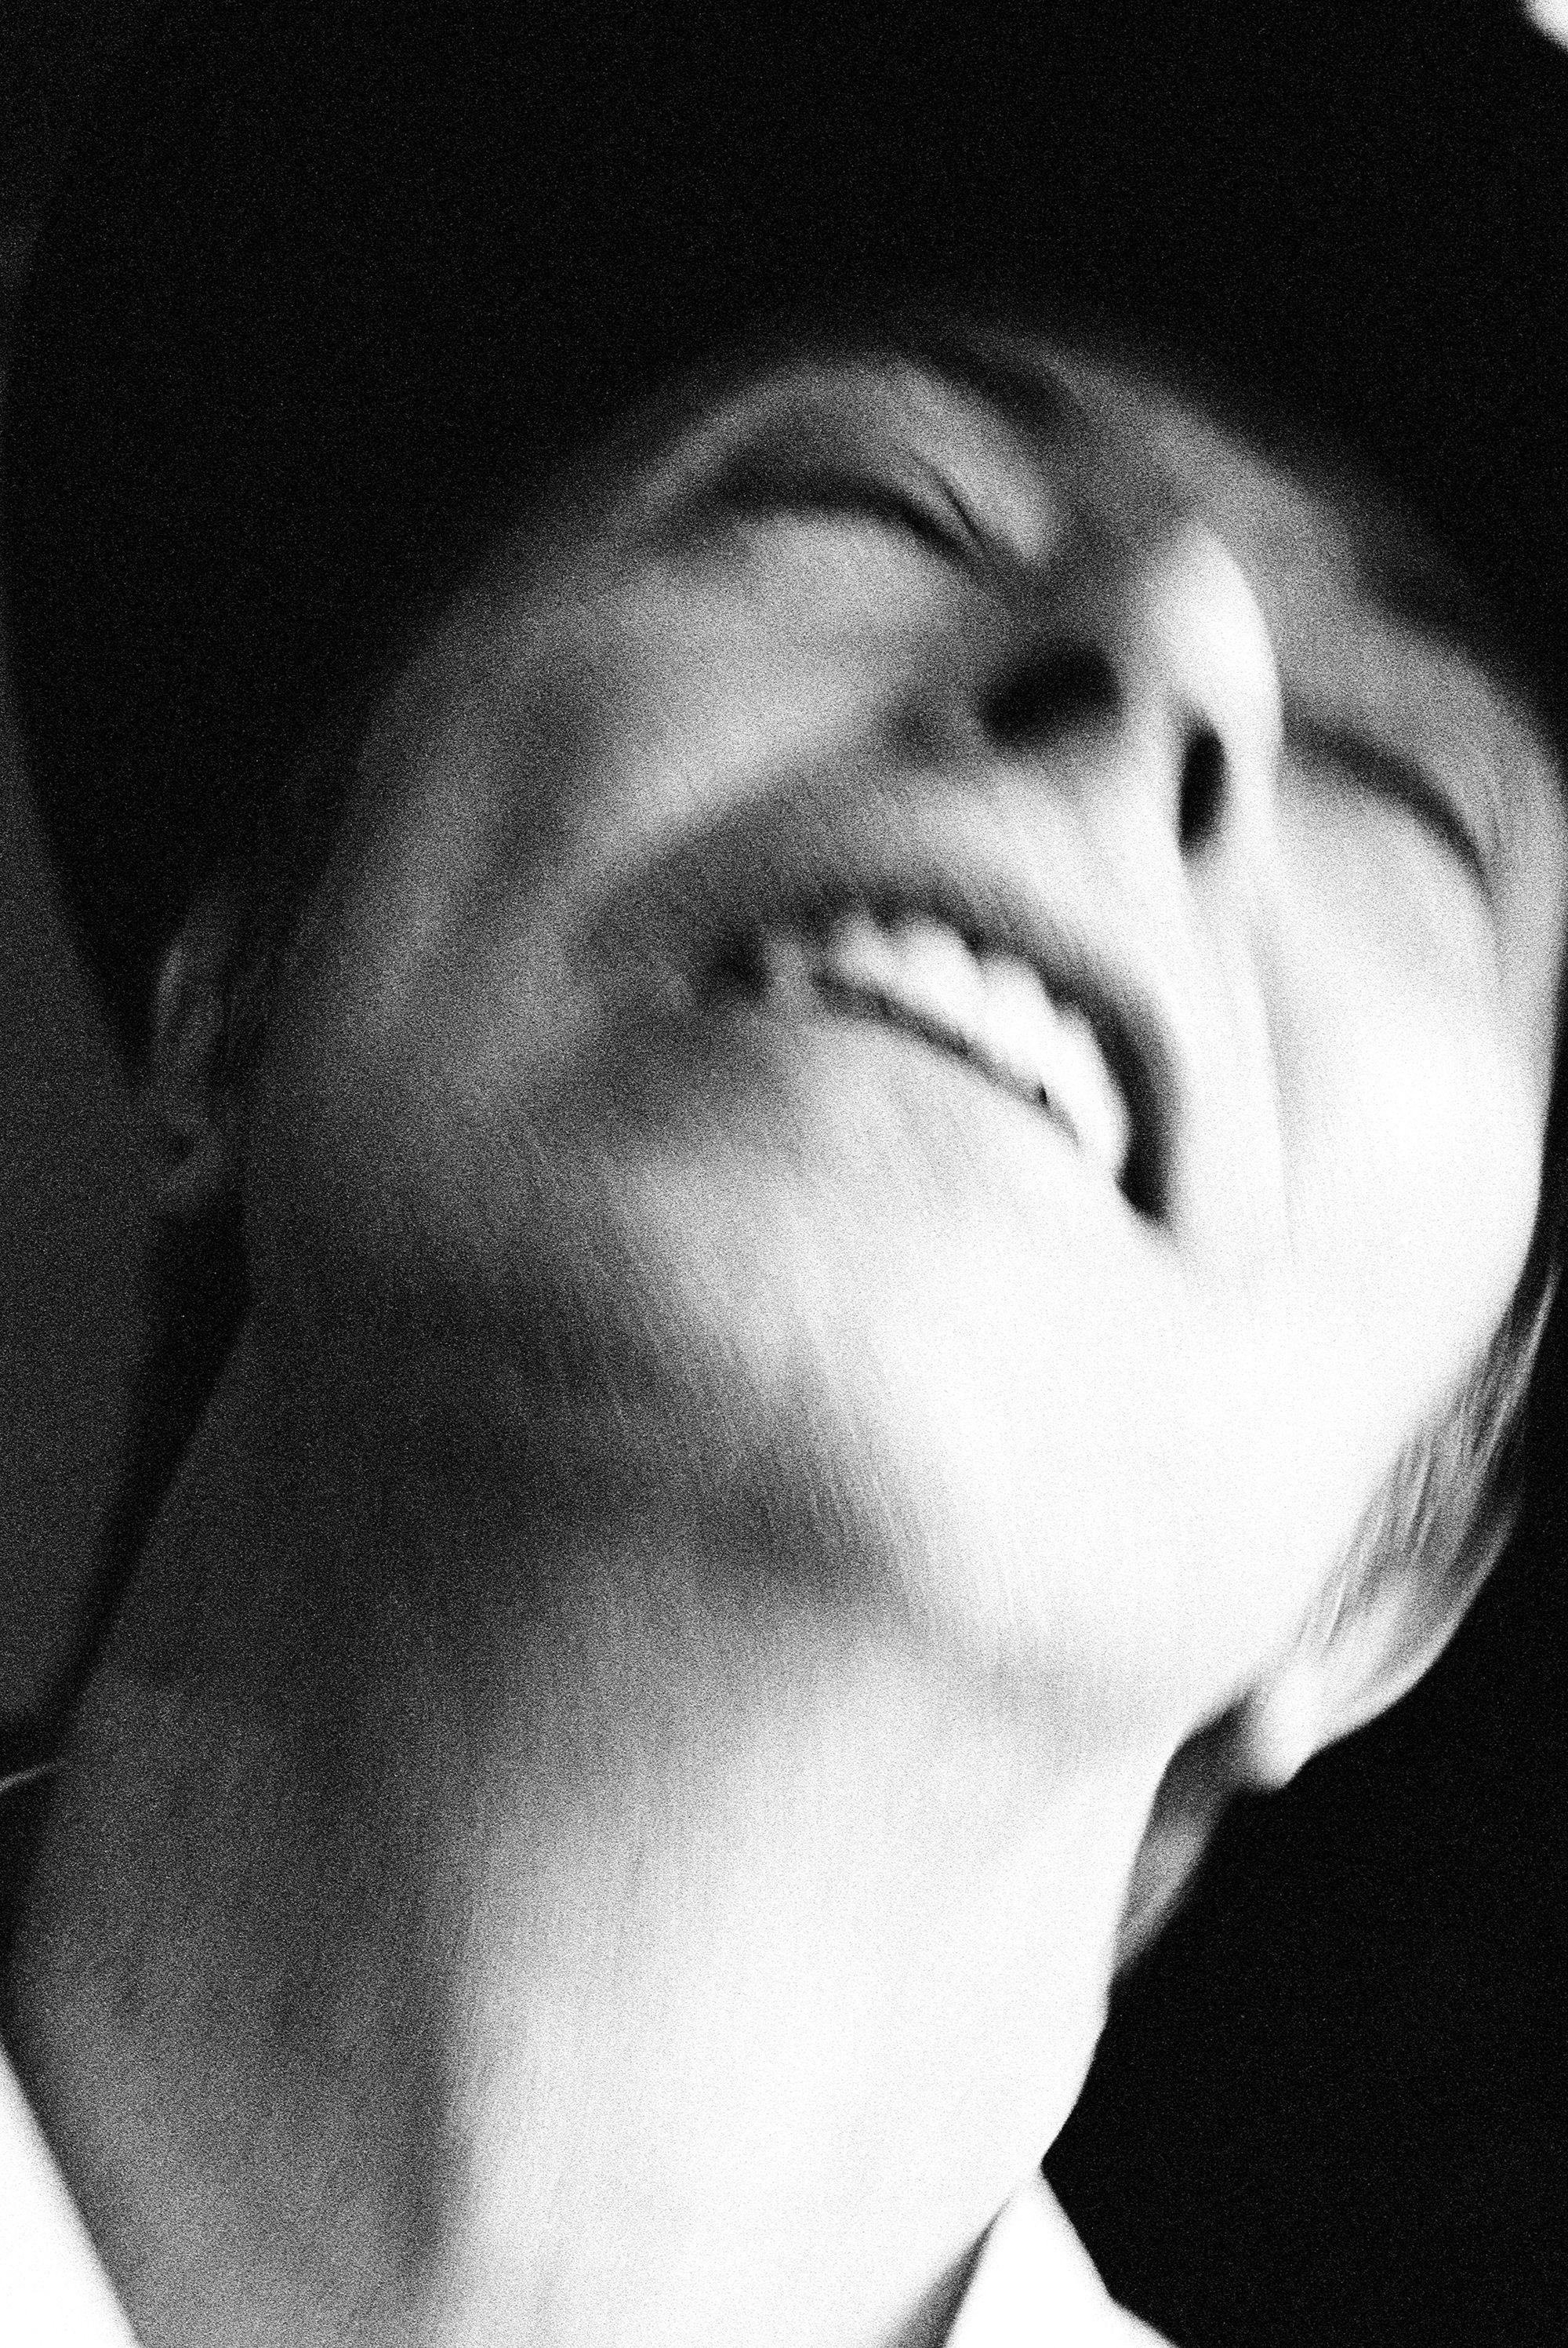 David Bowie for V magazine